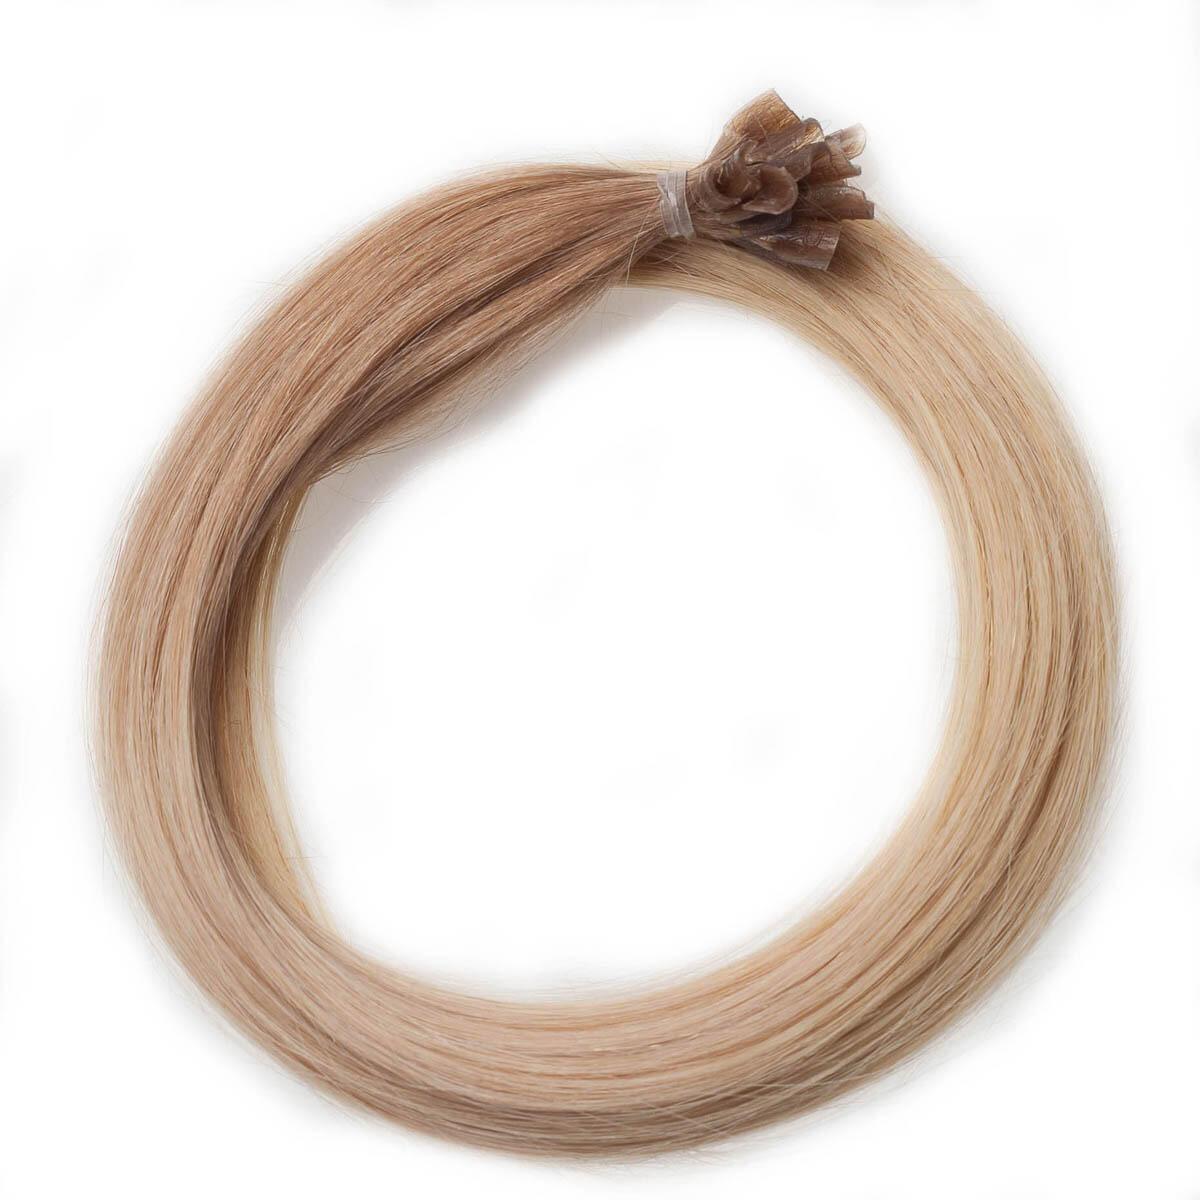 Nail Hair O7.5/8.3 Golden Blond Ombre 40 cm